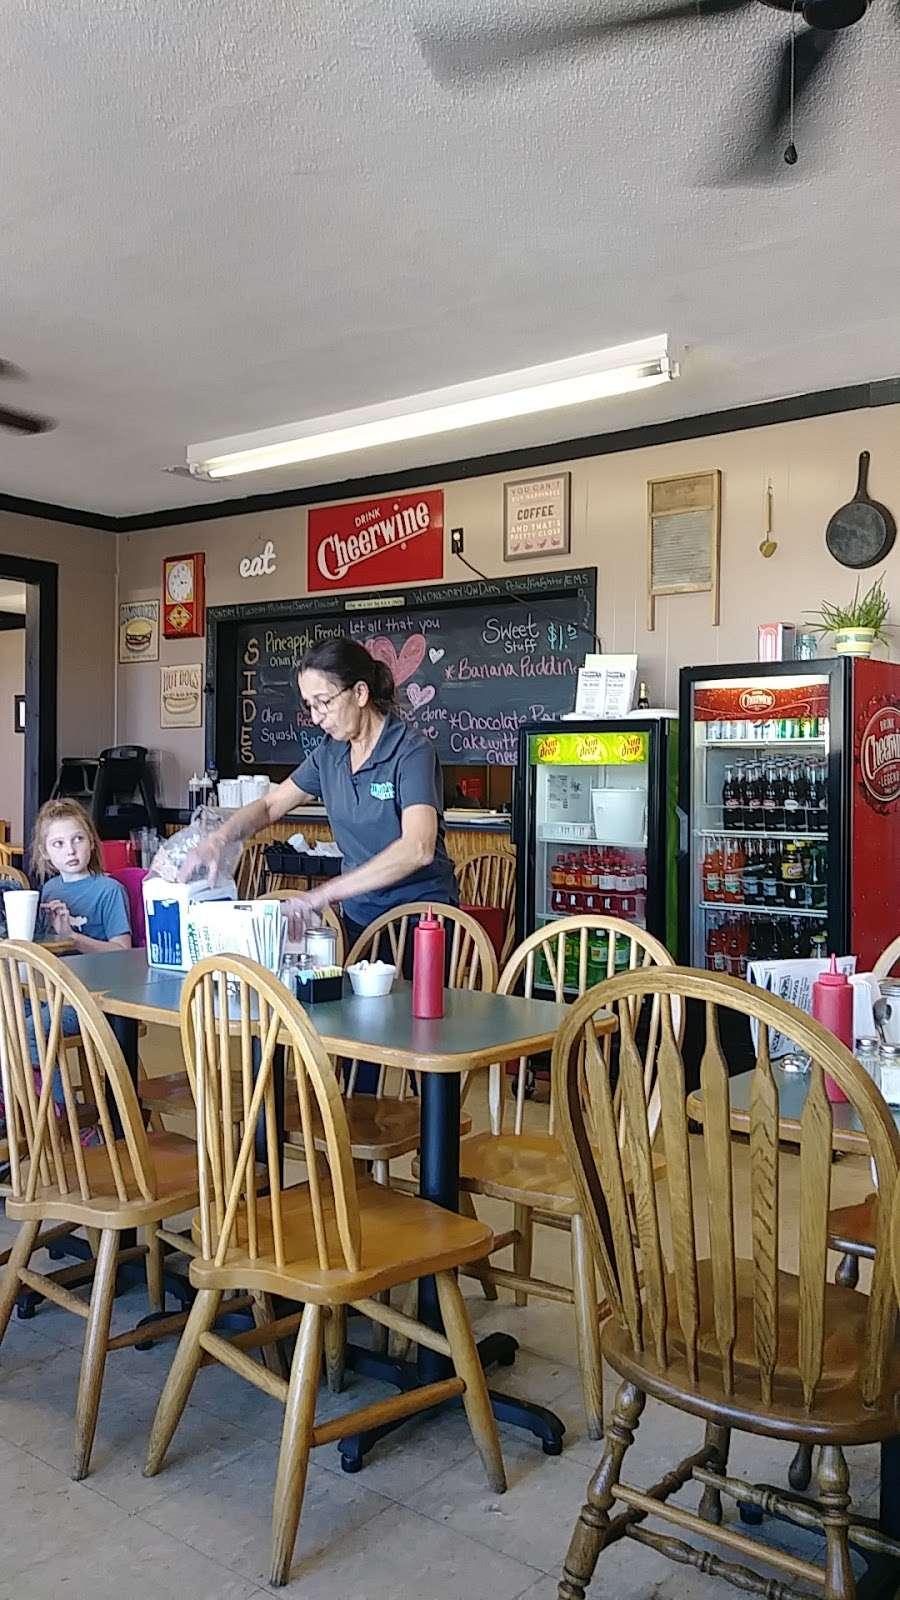 Wahoos Diner - restaurant  | Photo 5 of 9 | Address: 110 N Salisbury GQ Ave, Salisbury, NC 28146, USA | Phone: (704) 209-0503